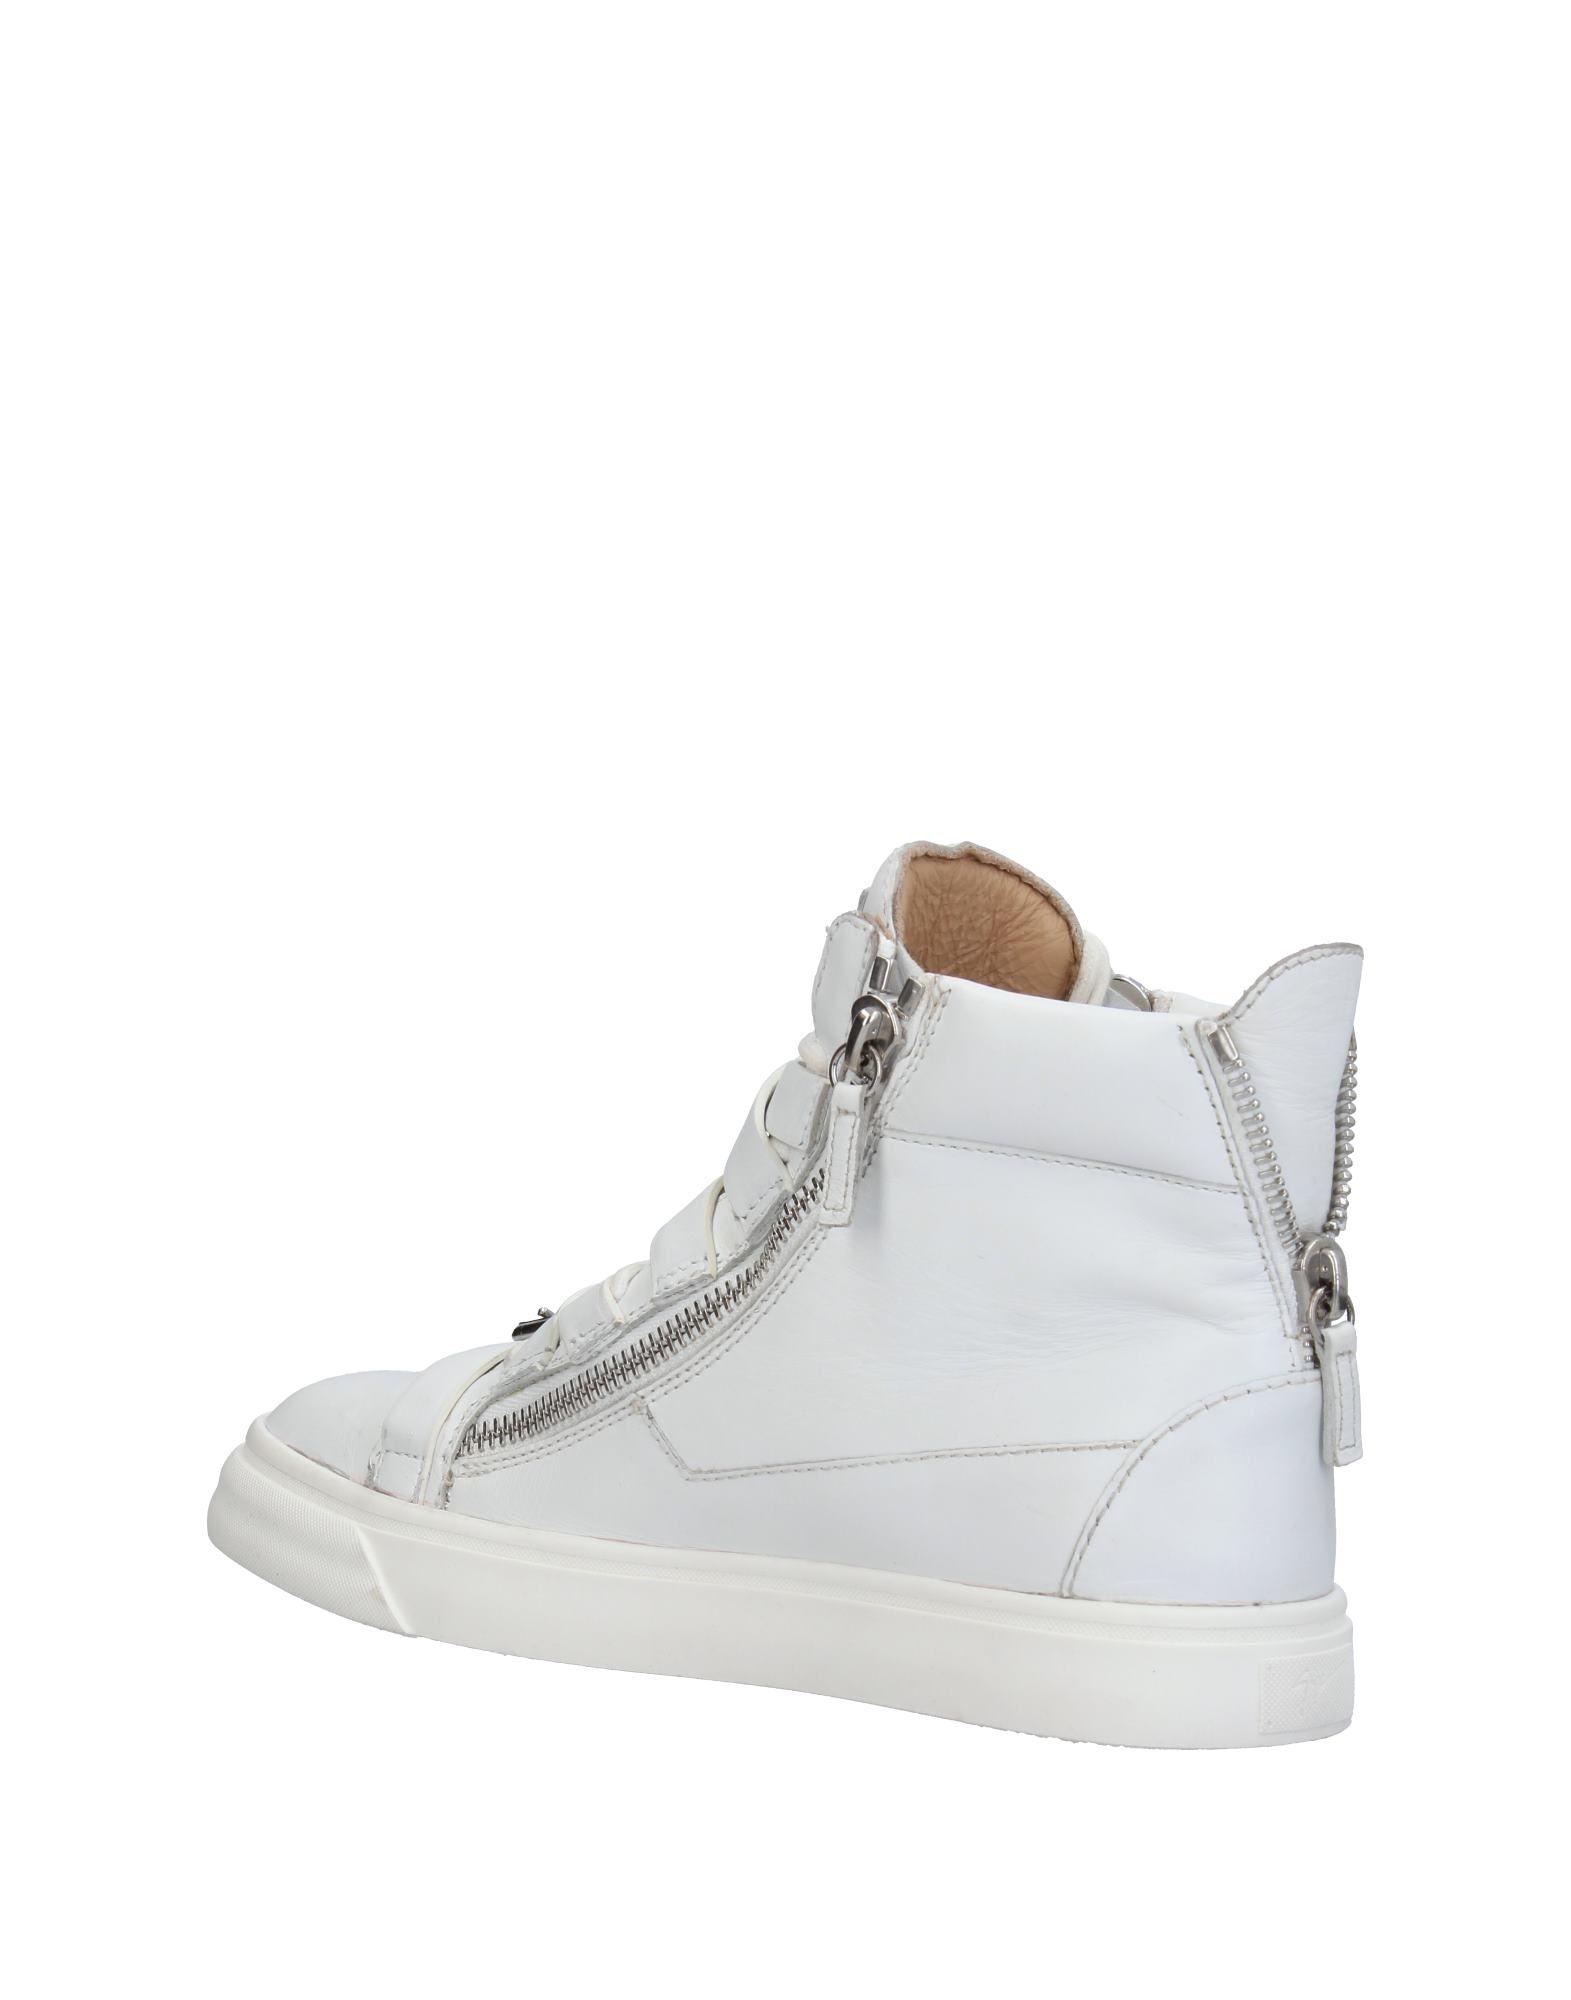 Giuseppe Zanotti Sneakers Herren  11377677ET Gute Qualität beliebte Schuhe